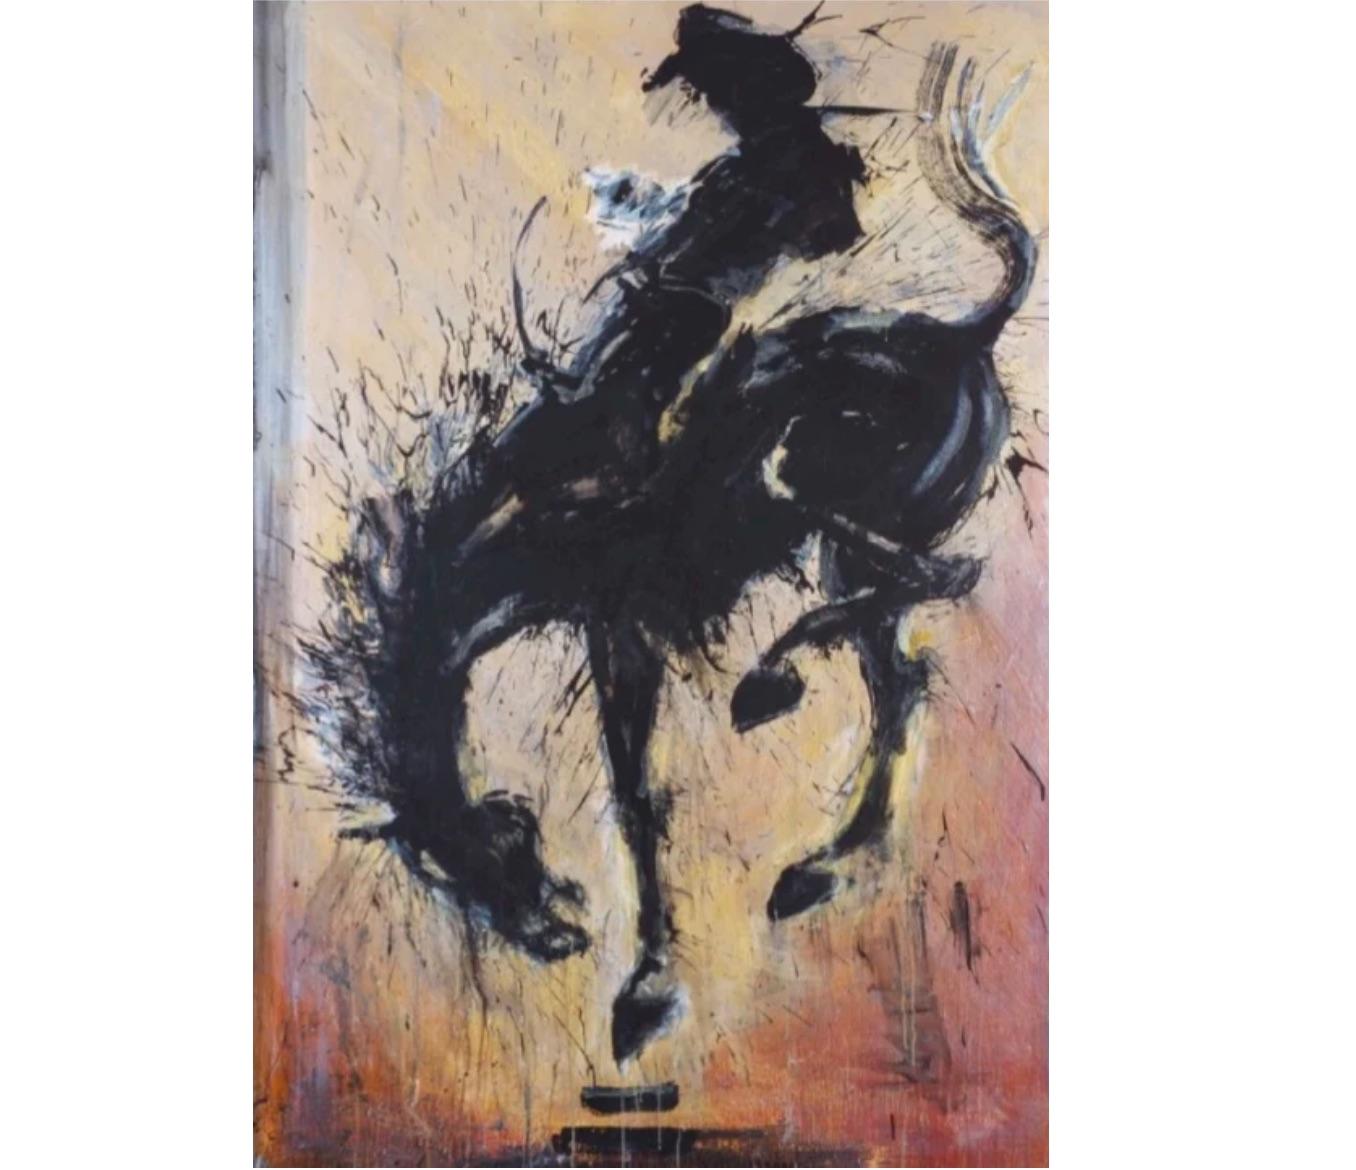 Horse and Rider, 2015 by Richard Hambleton_1